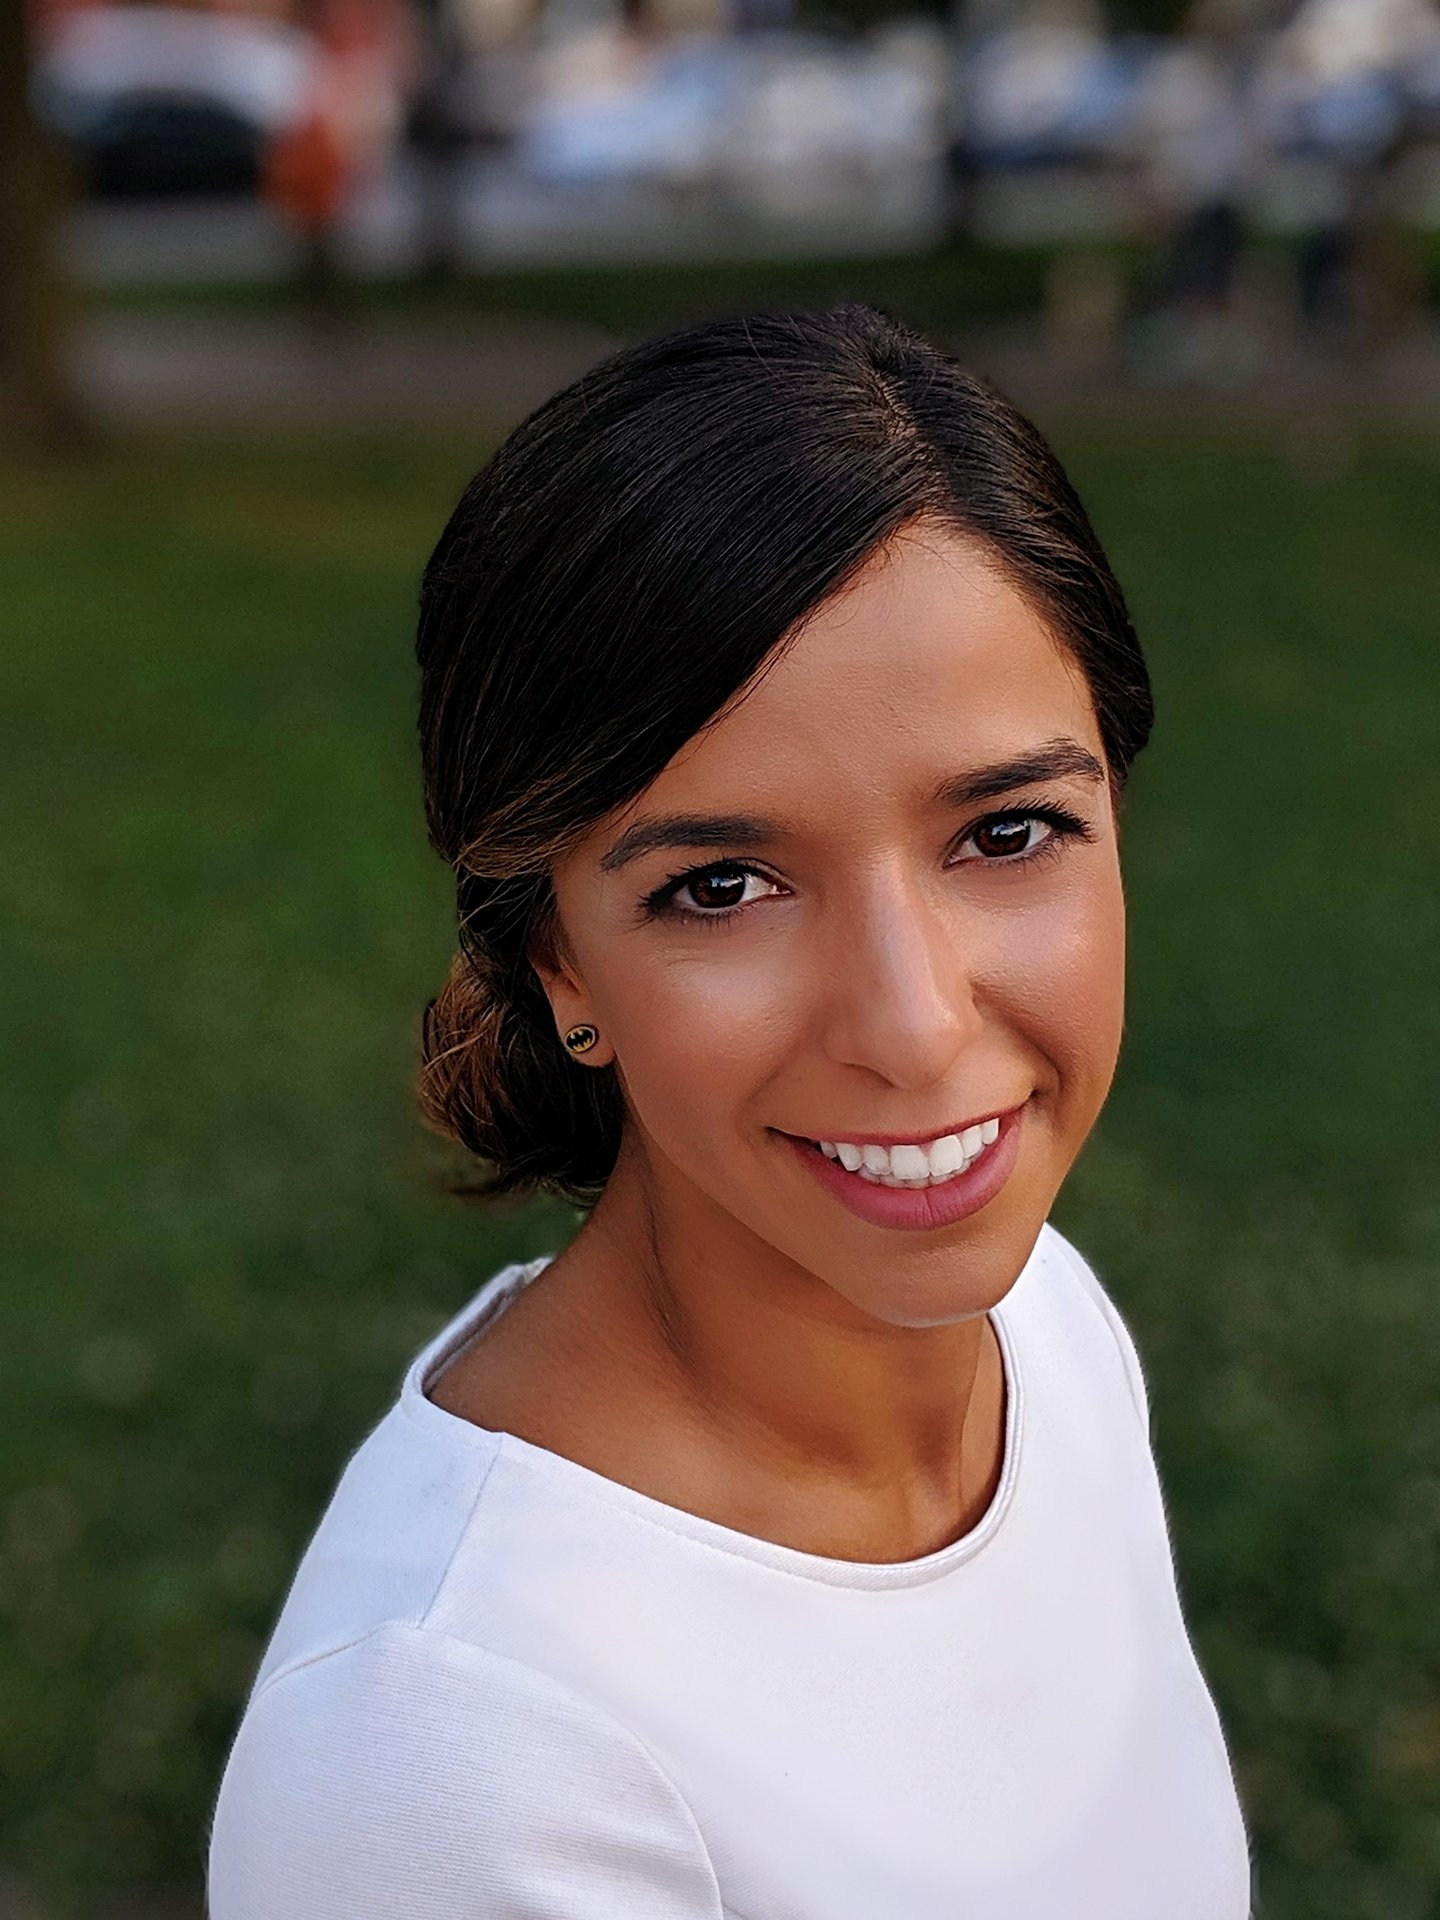 Nika Nour, executive director, IGDA Foundation